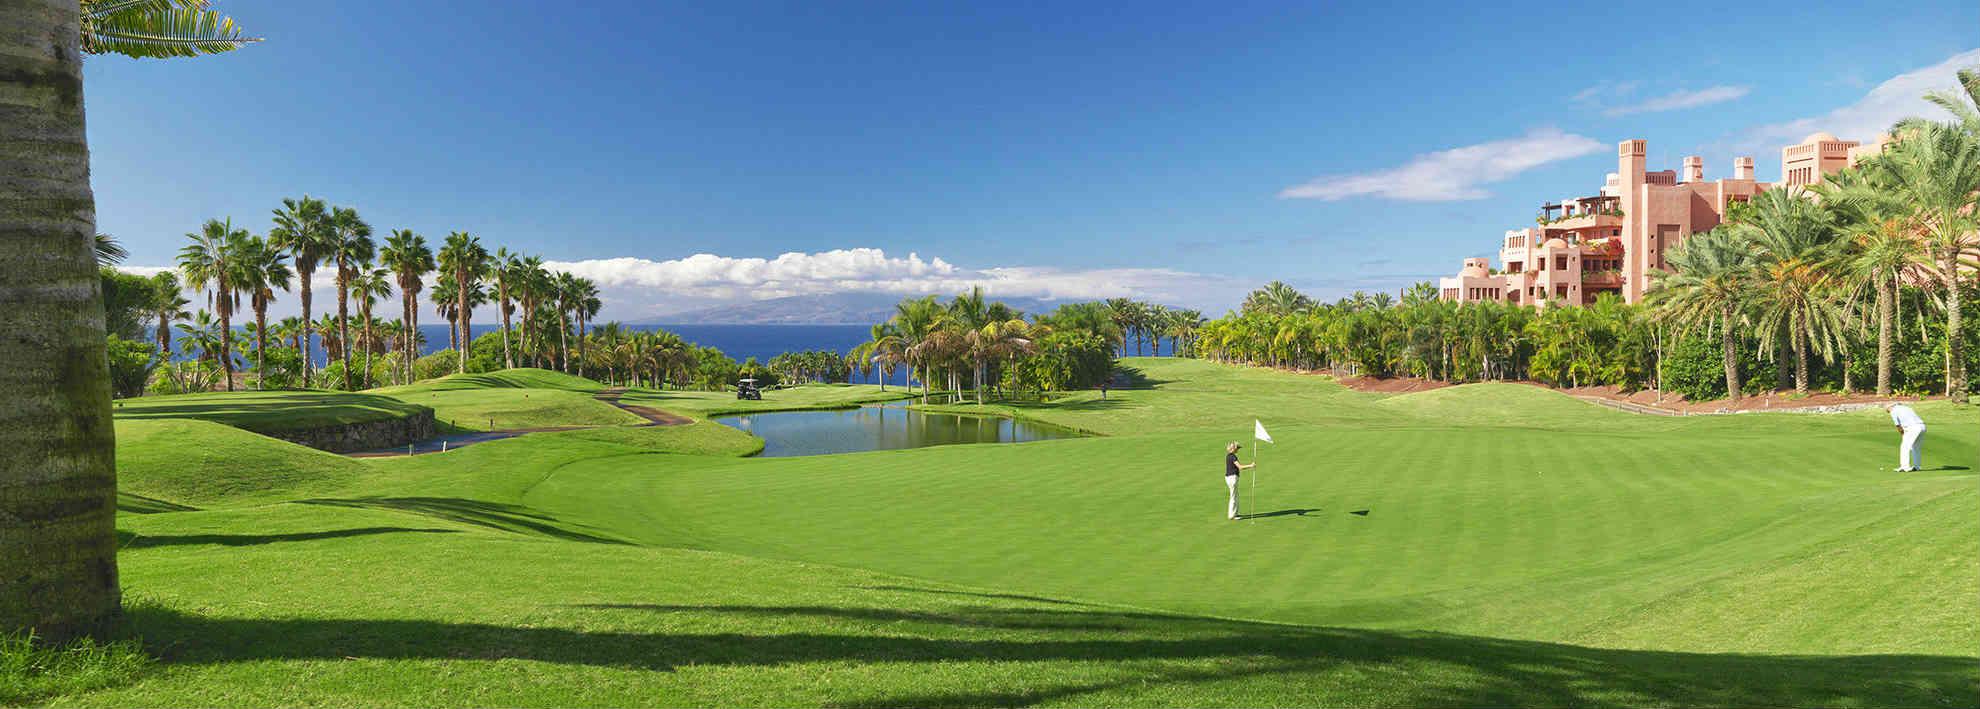 sejours-voyages-golf-espagne